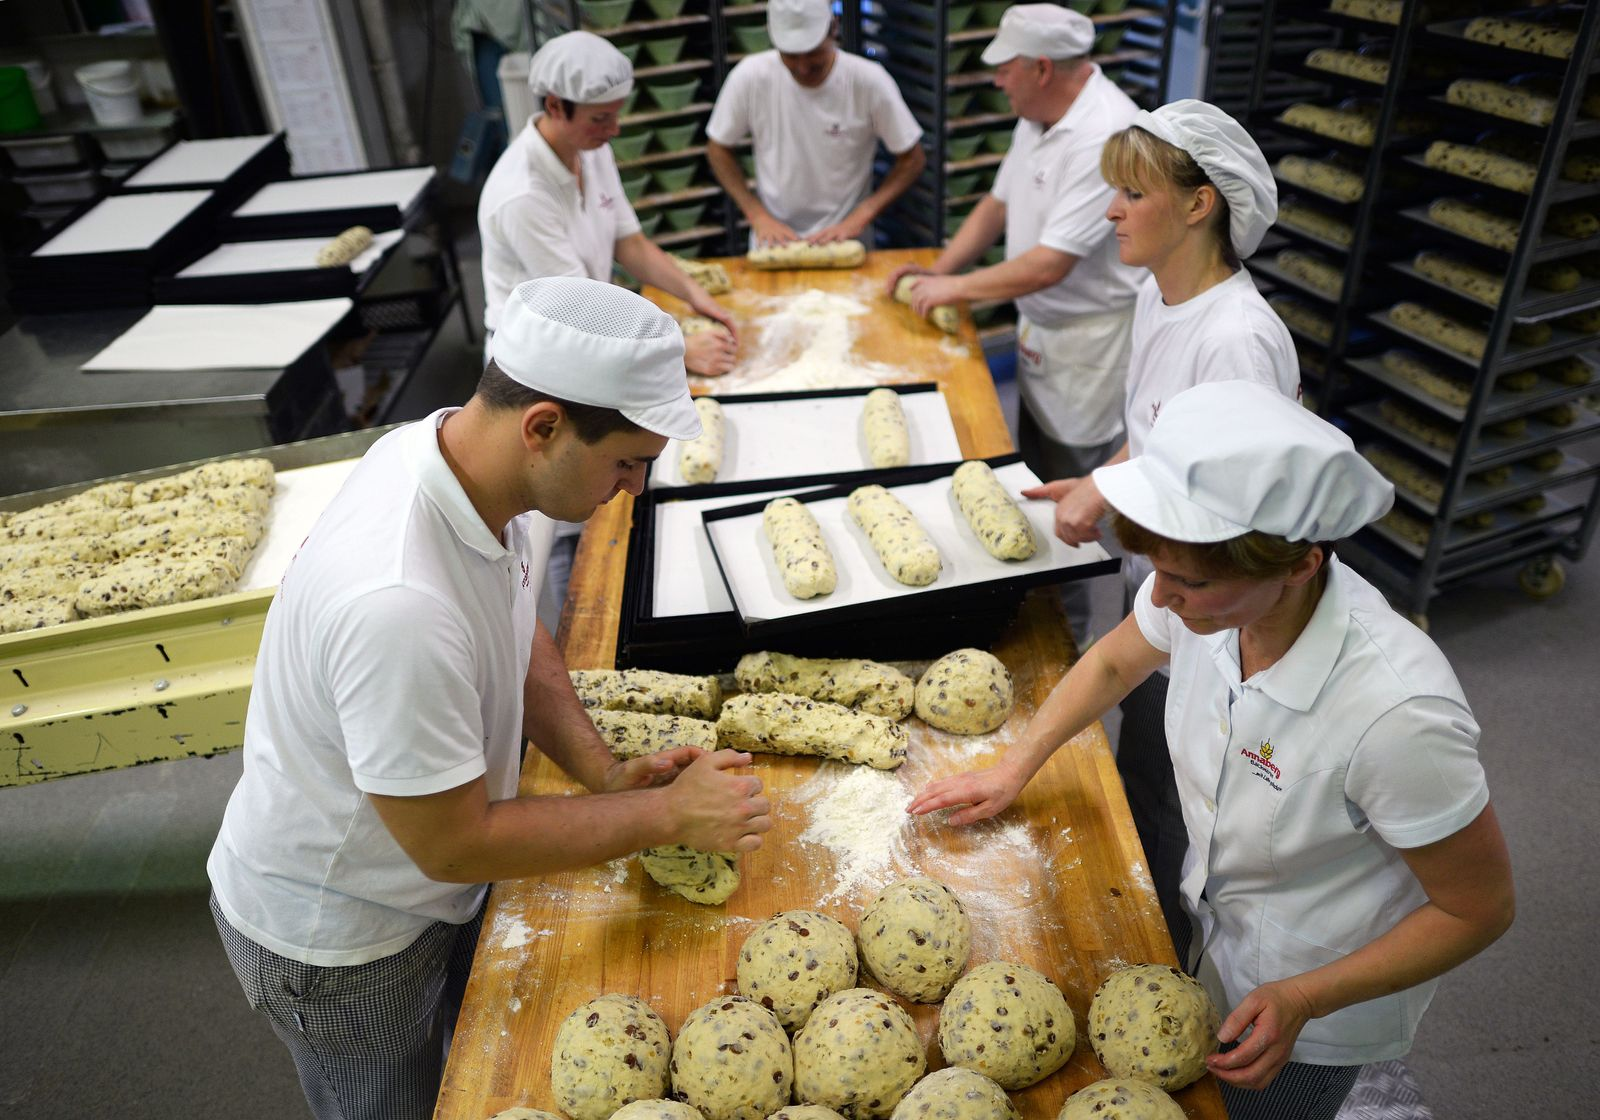 Sächsische Bäcker